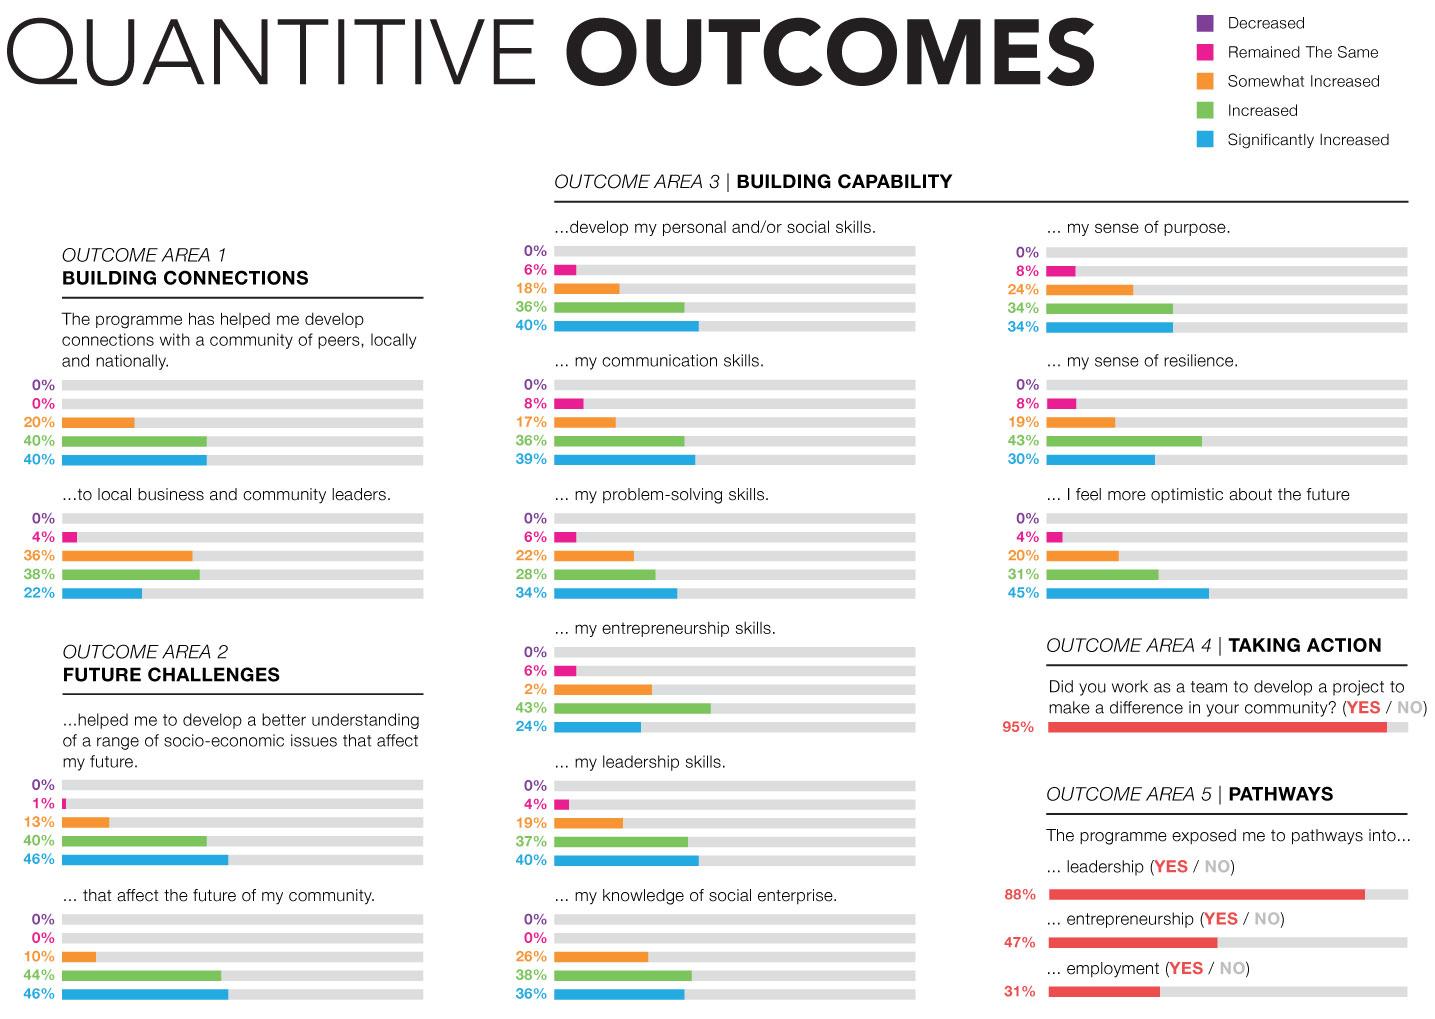 QuantitativeOutcomes_fullHeight.jpg